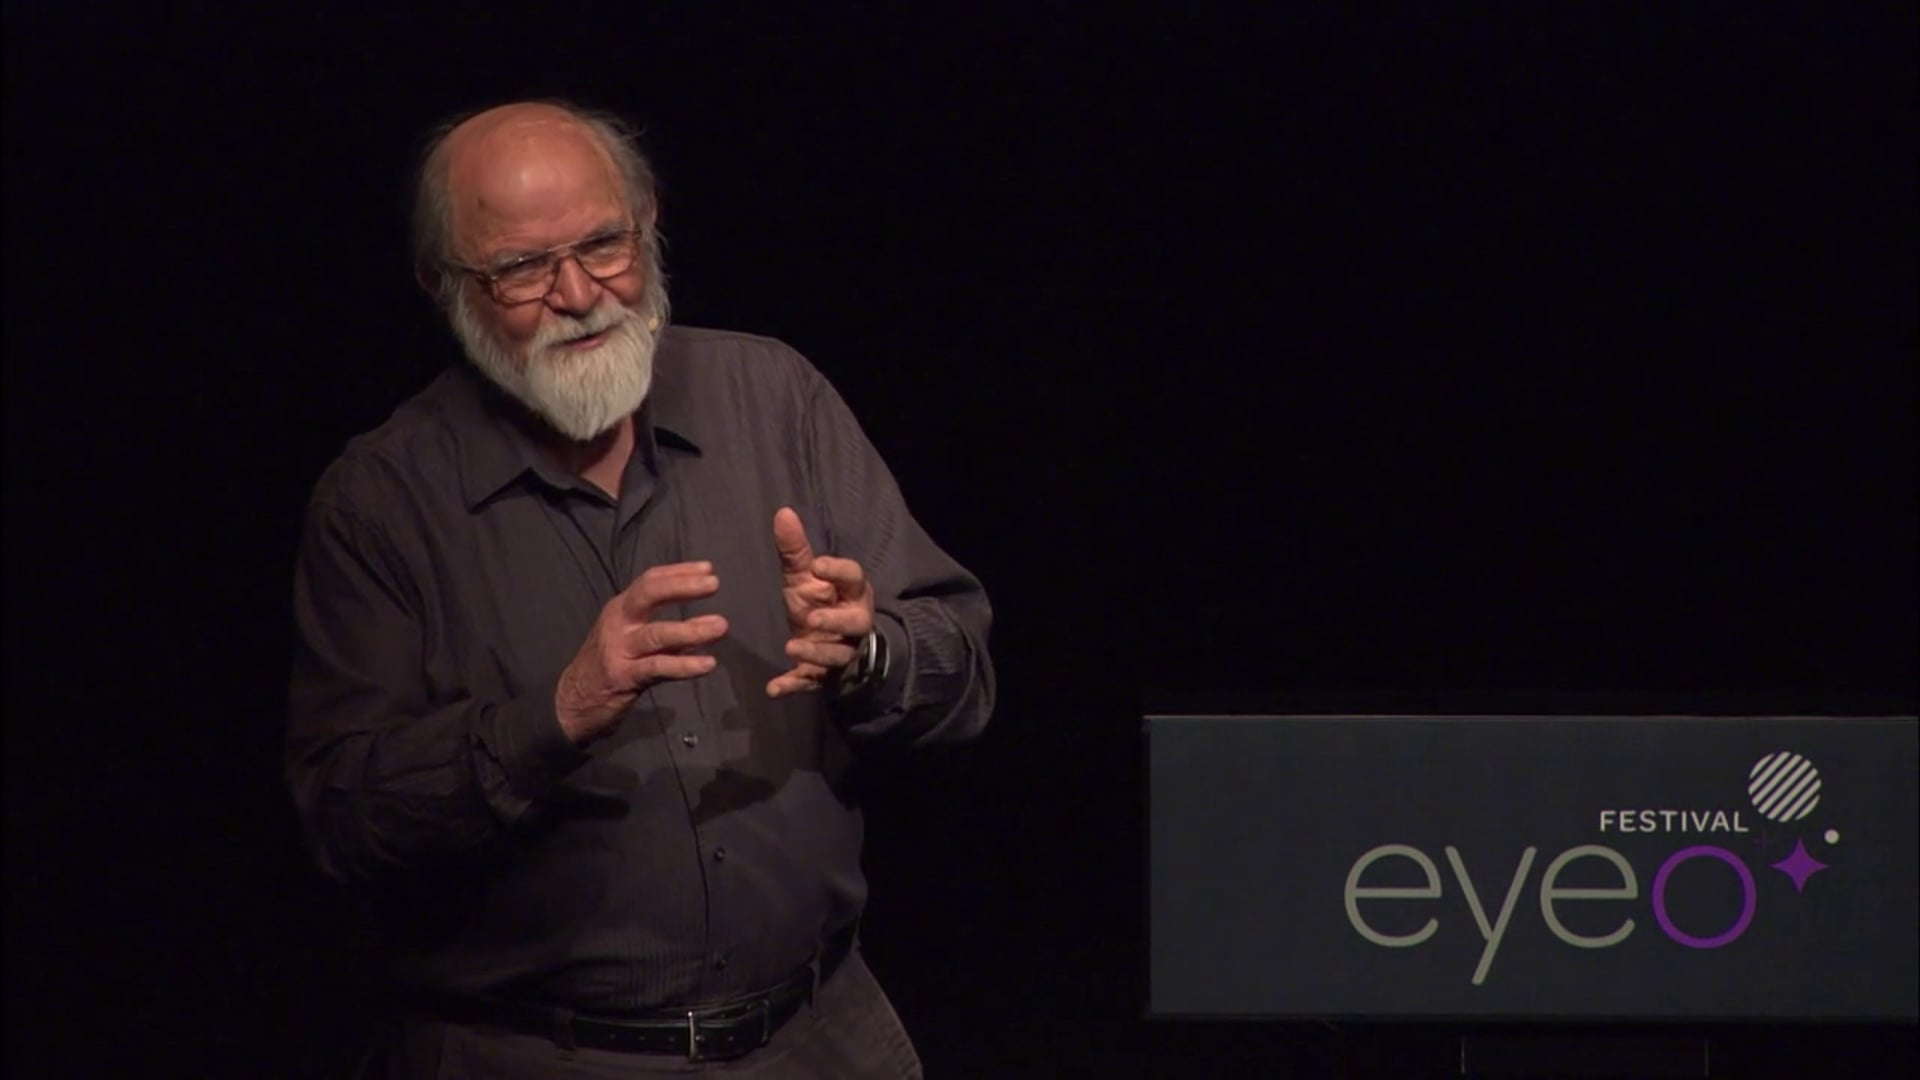 Eyeo 2014 - Roman Verostko